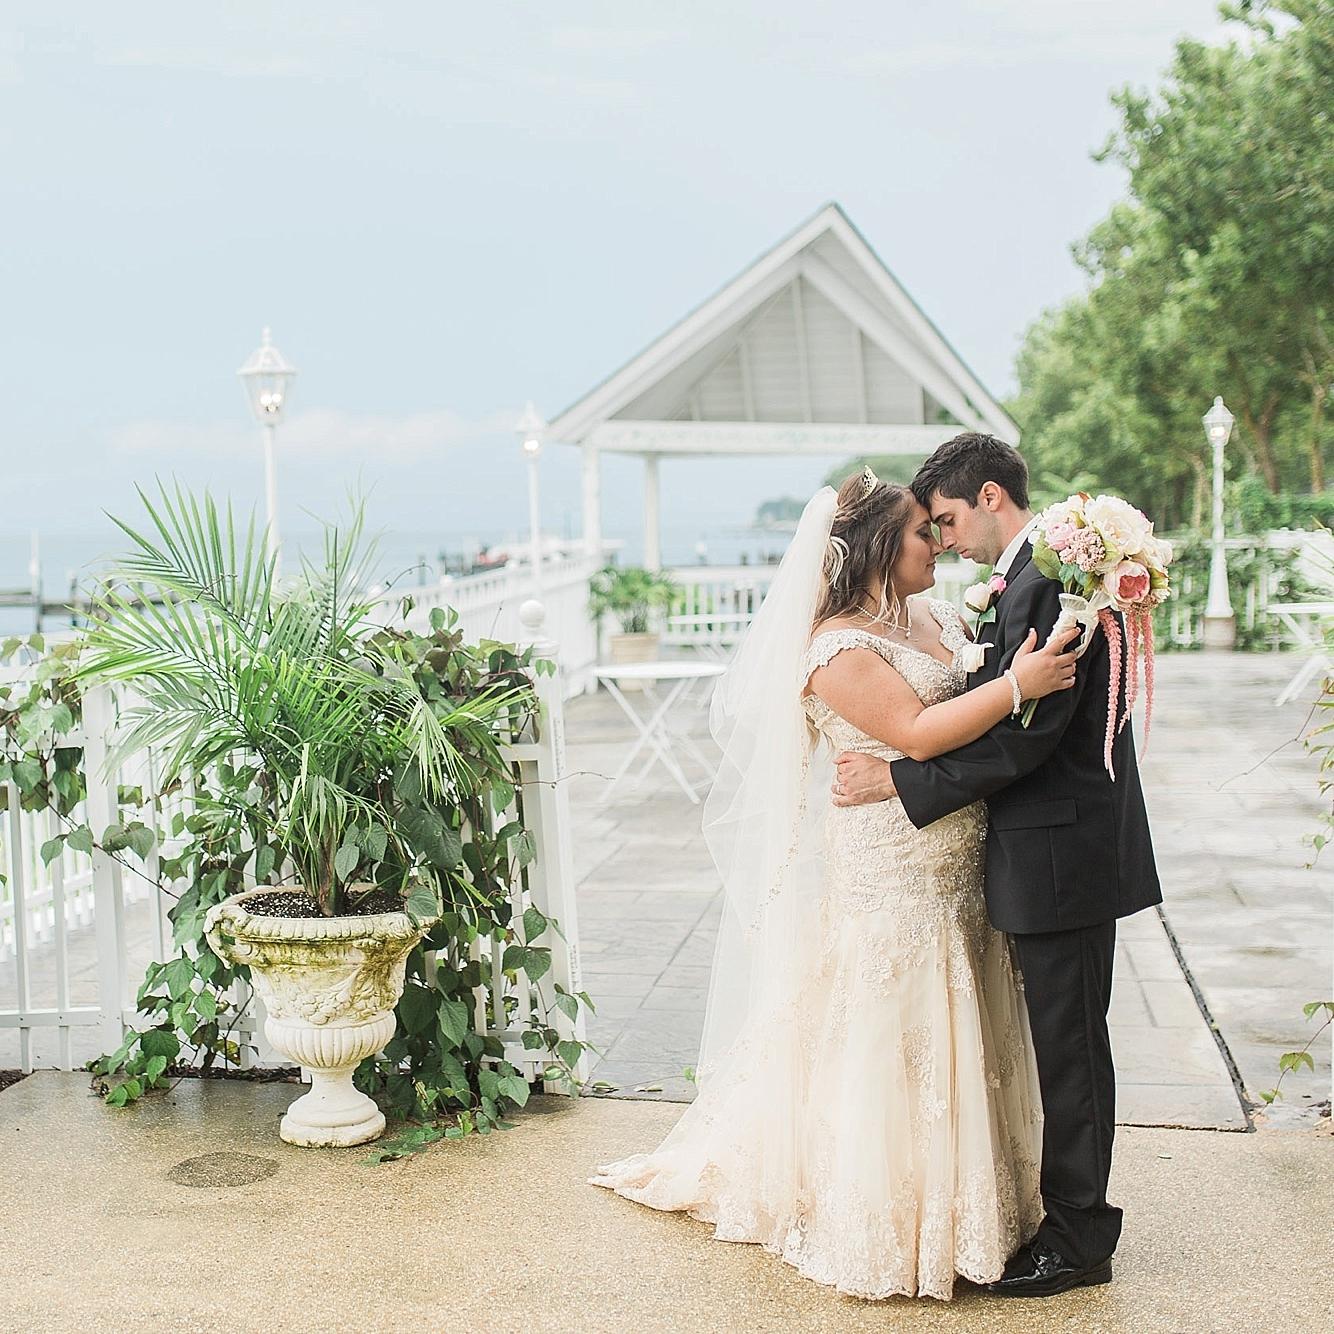 Denver Azur Lane: McKenzie & Lou's Wedding